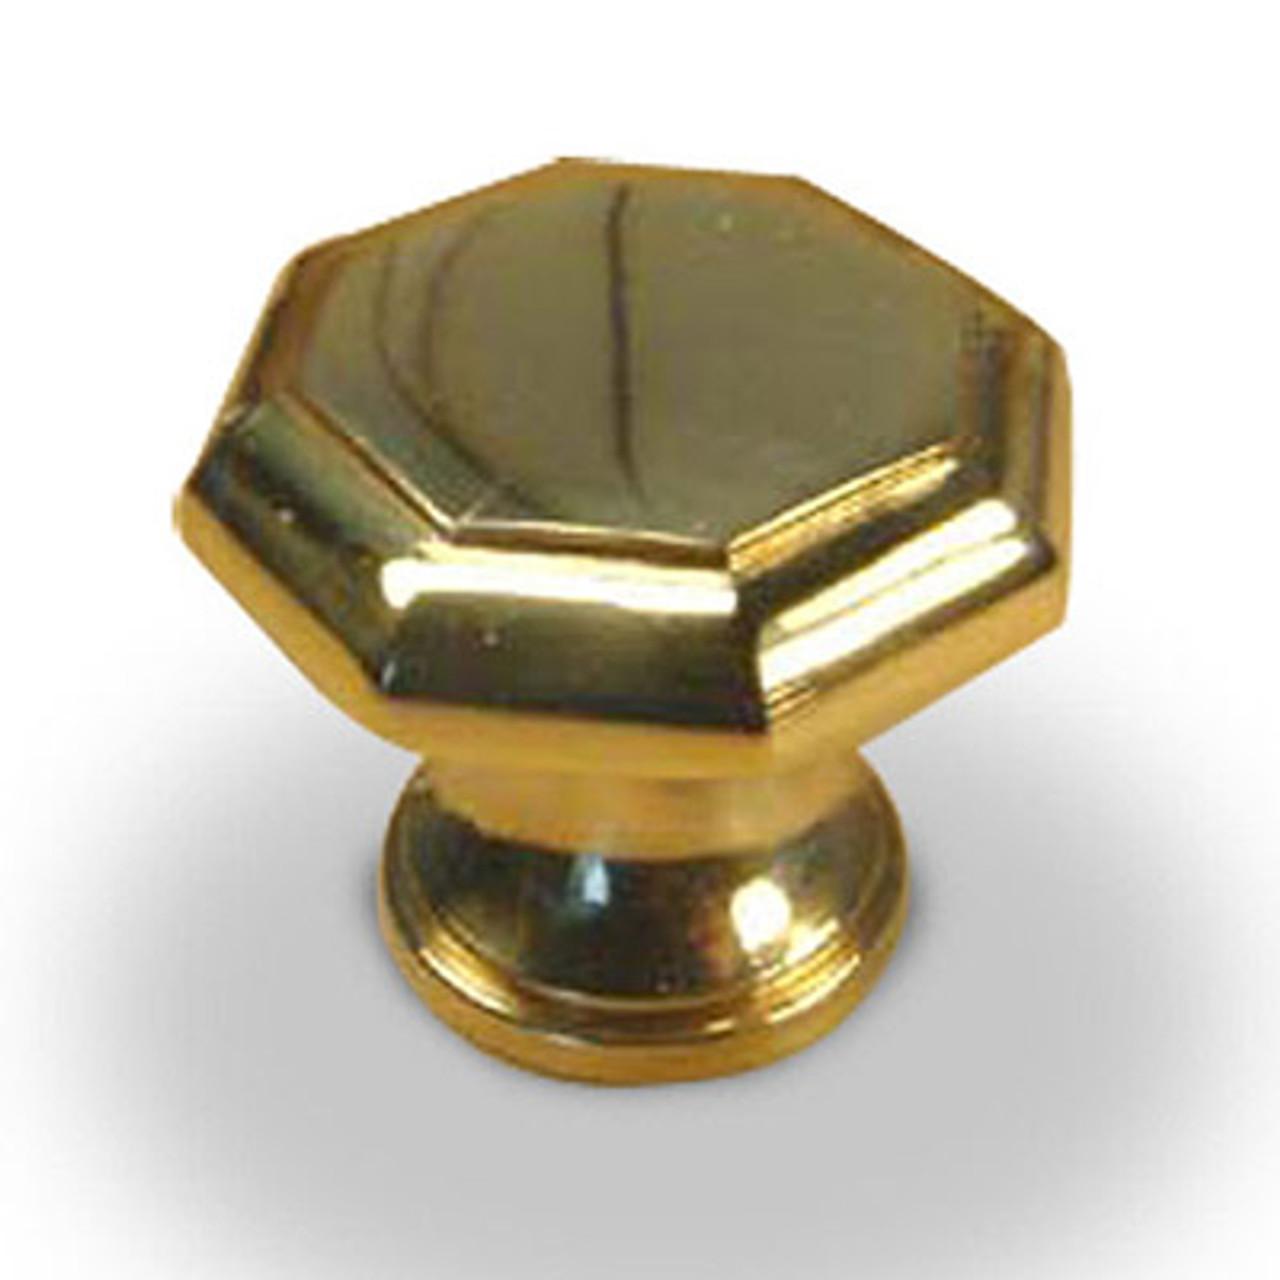 "Classique - Premium Solid Brass, Knob, 1-1/4"" dia. Polished Brass (CENT10205-3)"